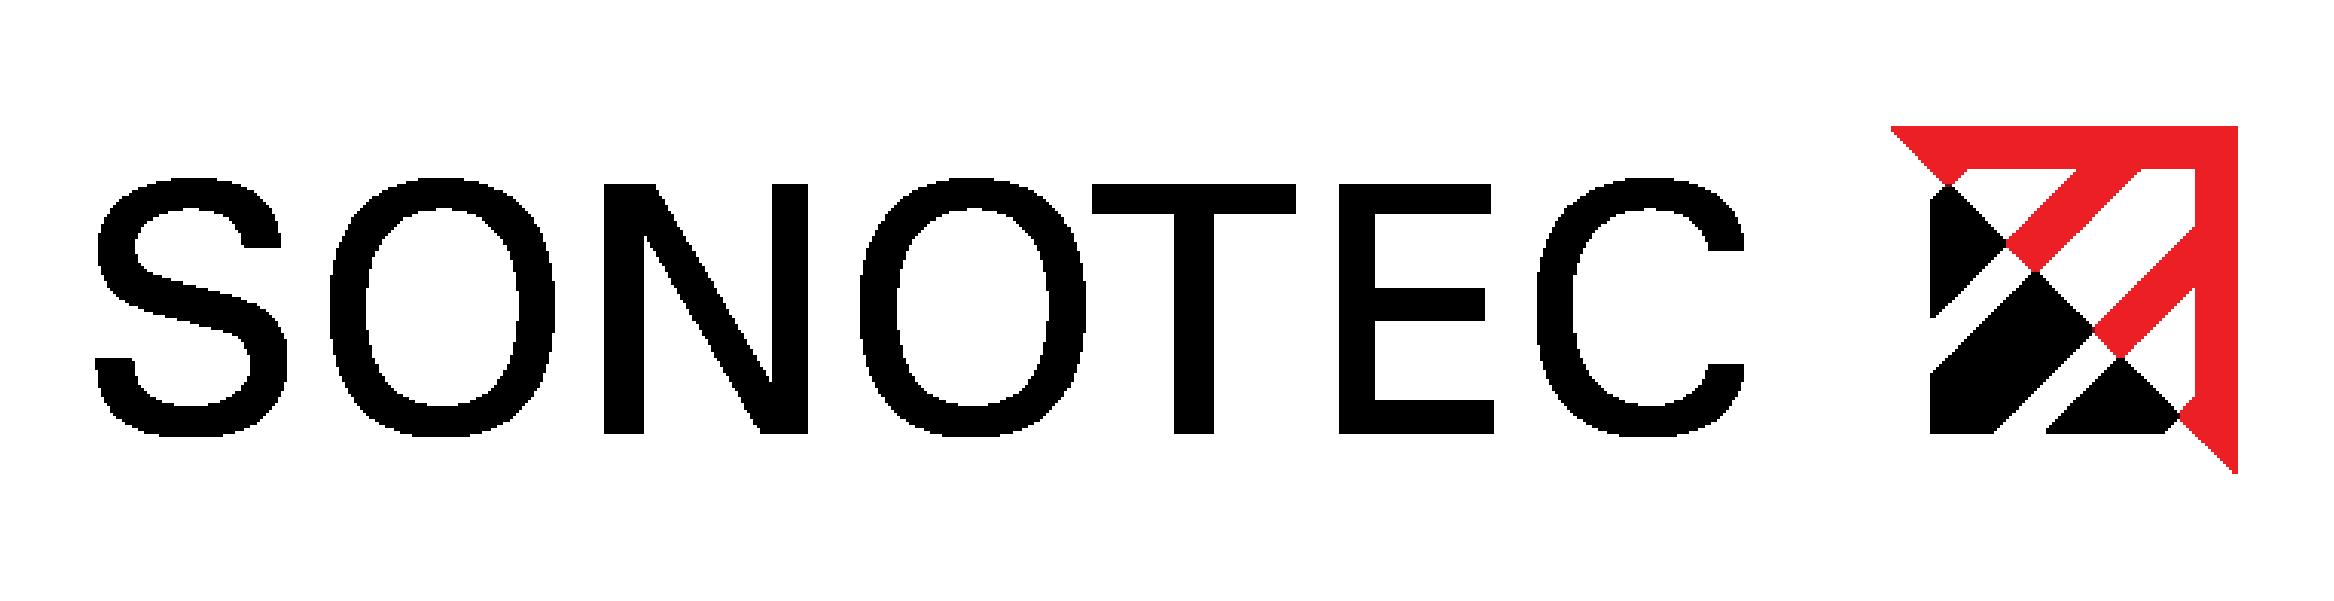 sonotec logo